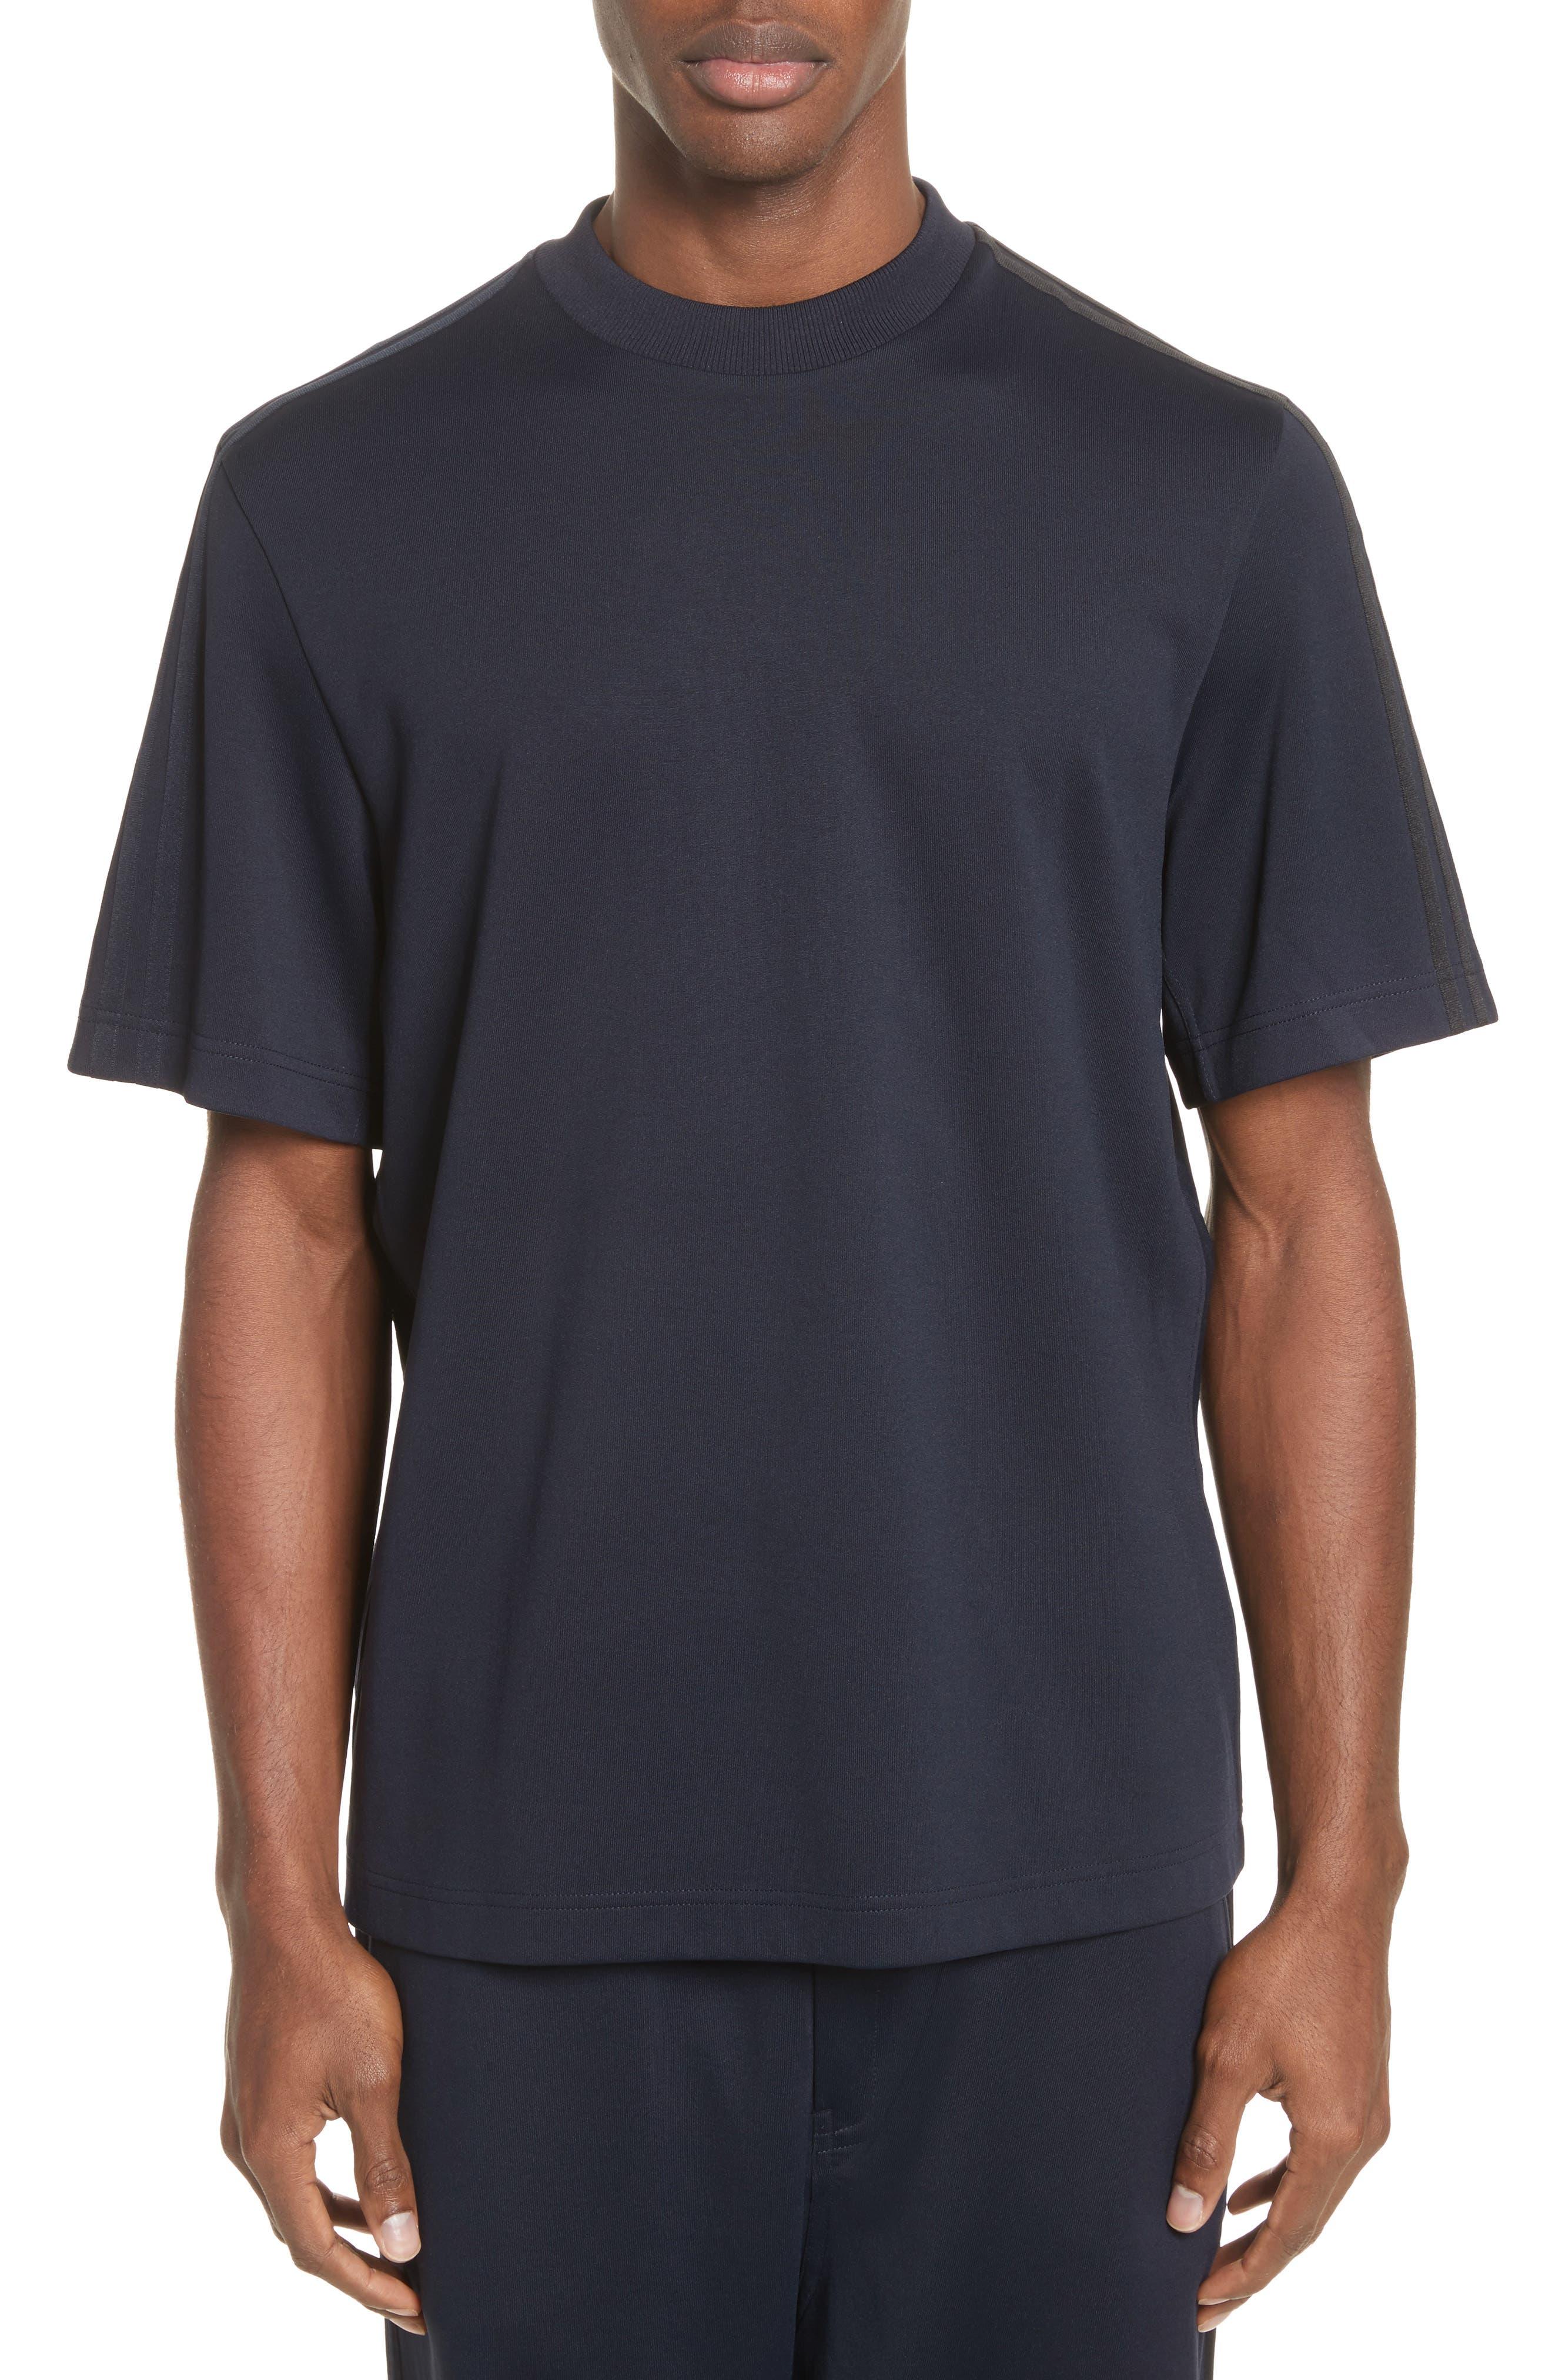 x adidas Tonal Stripe Crewneck T-Shirt,                             Main thumbnail 1, color,                             Navy